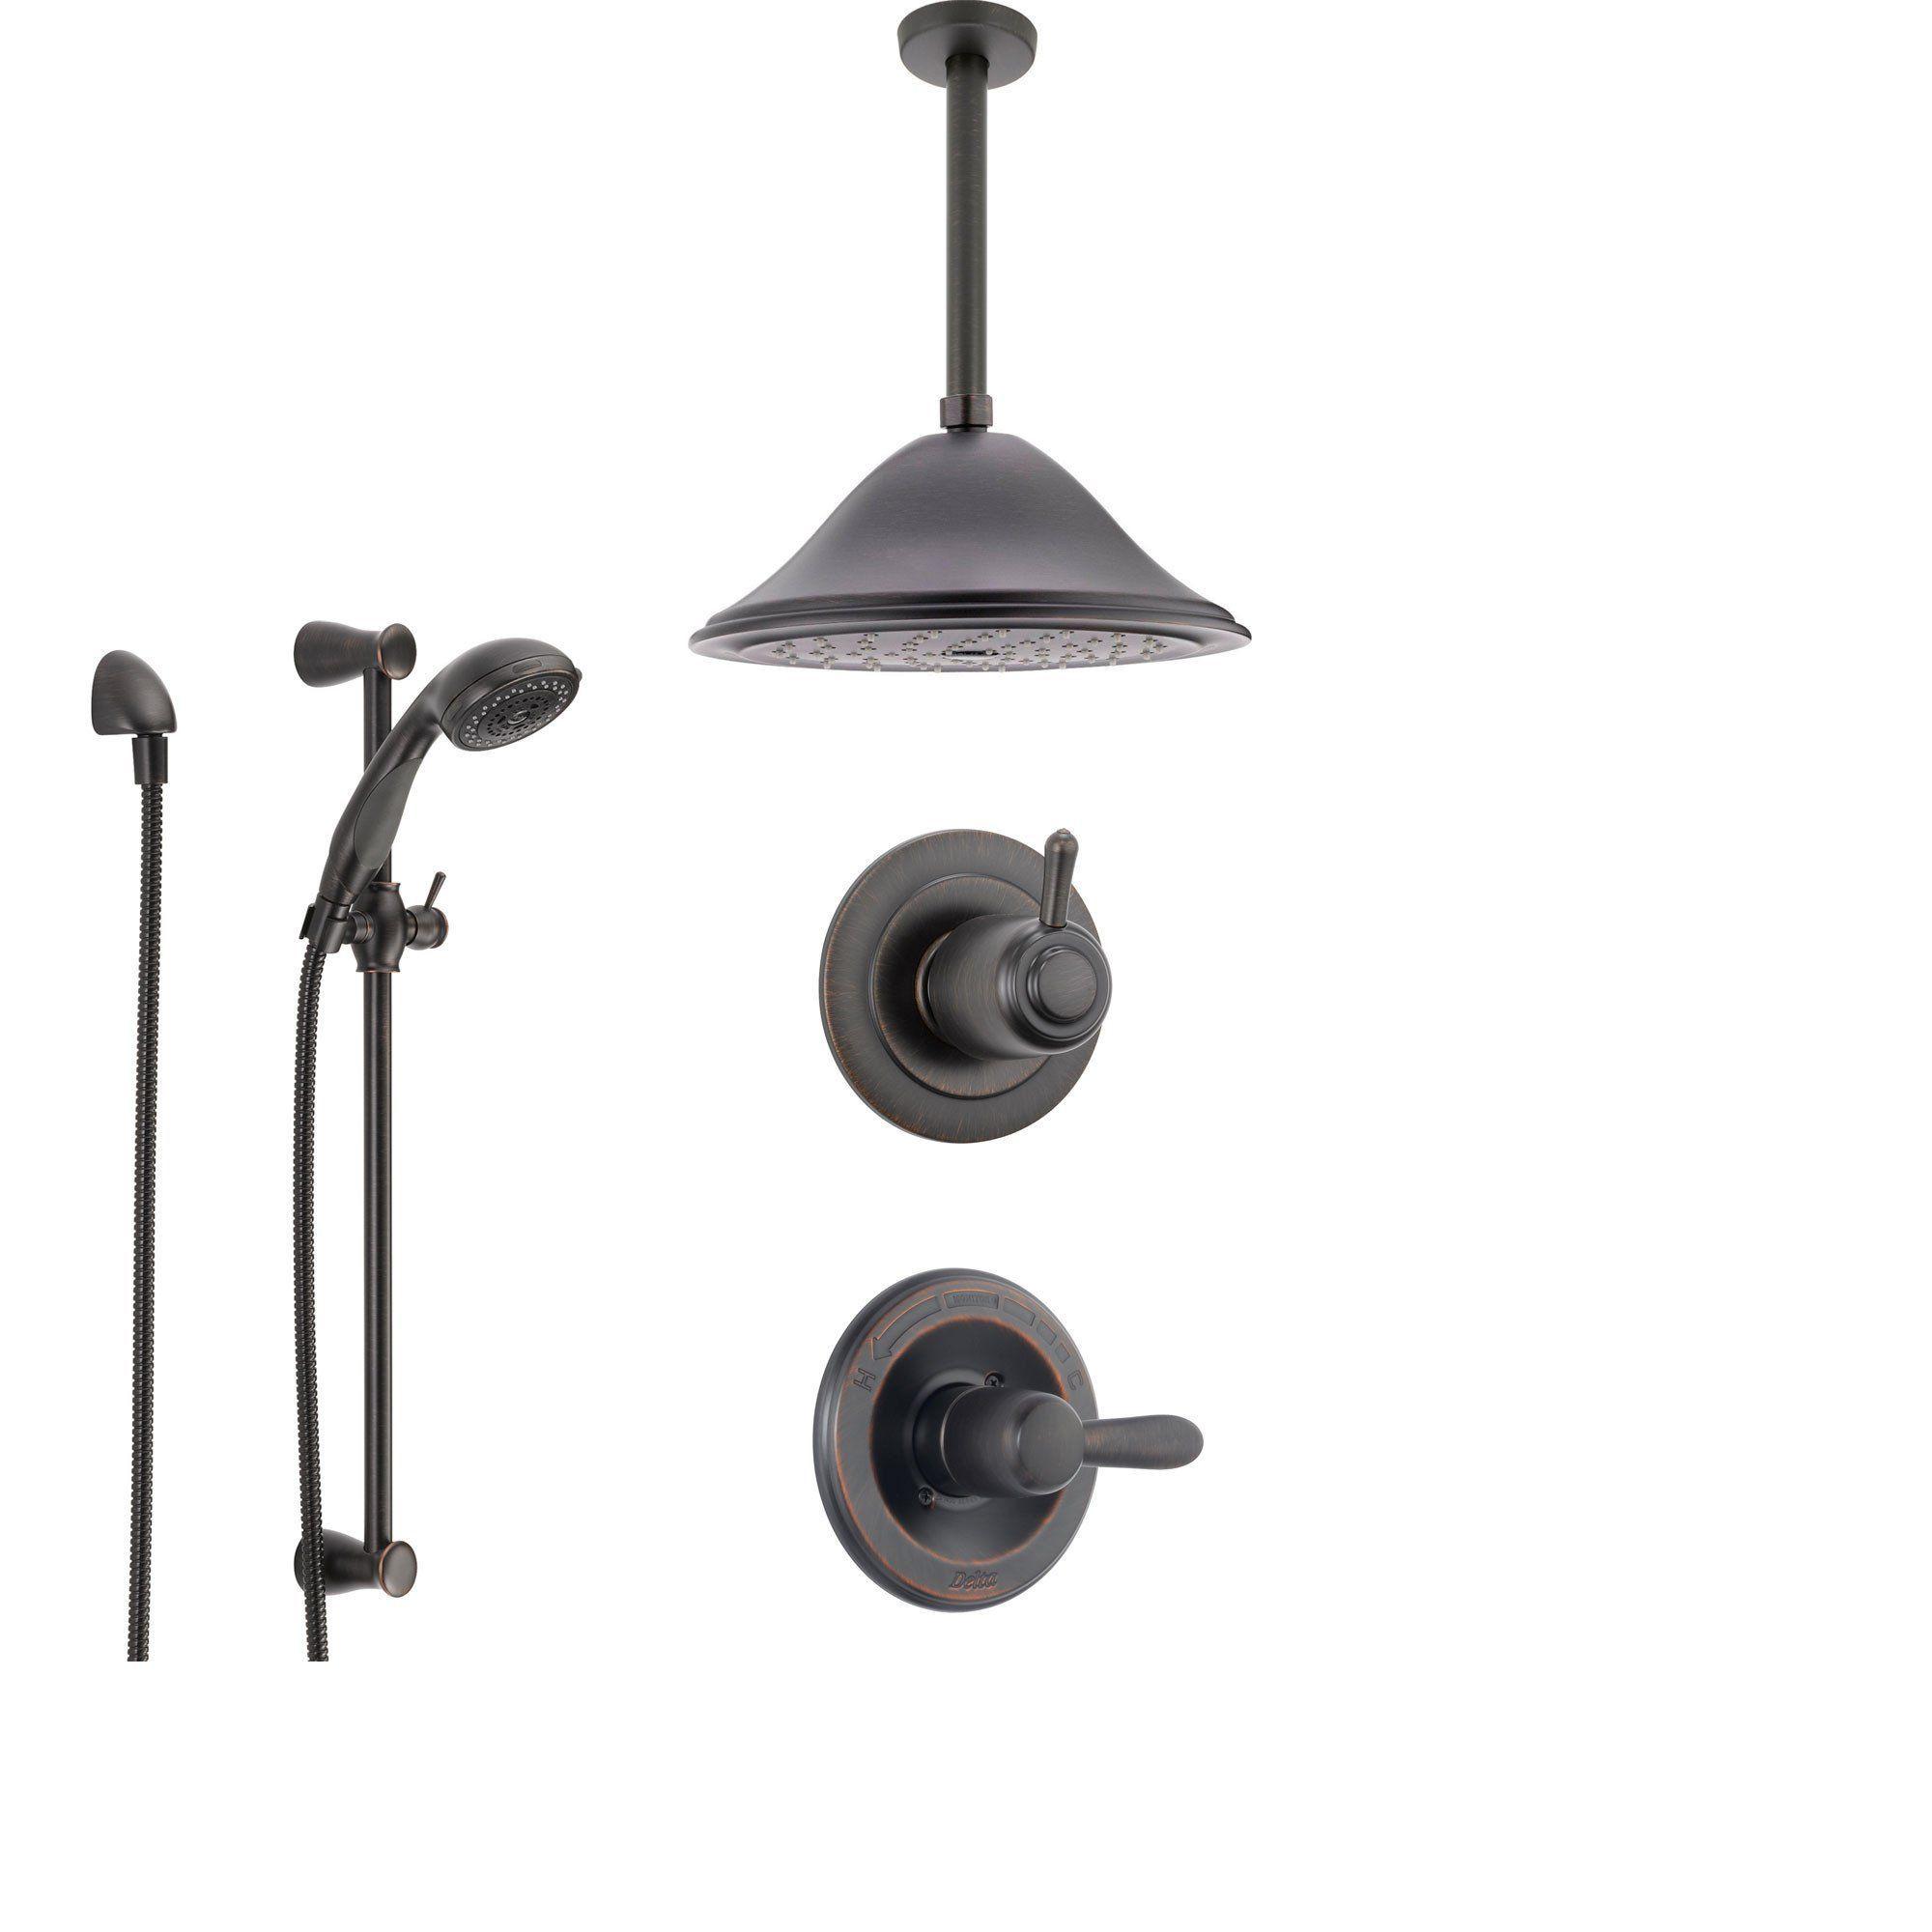 Delta Lahara Venetian Bronze Shower System with Normal Shower Handle ...